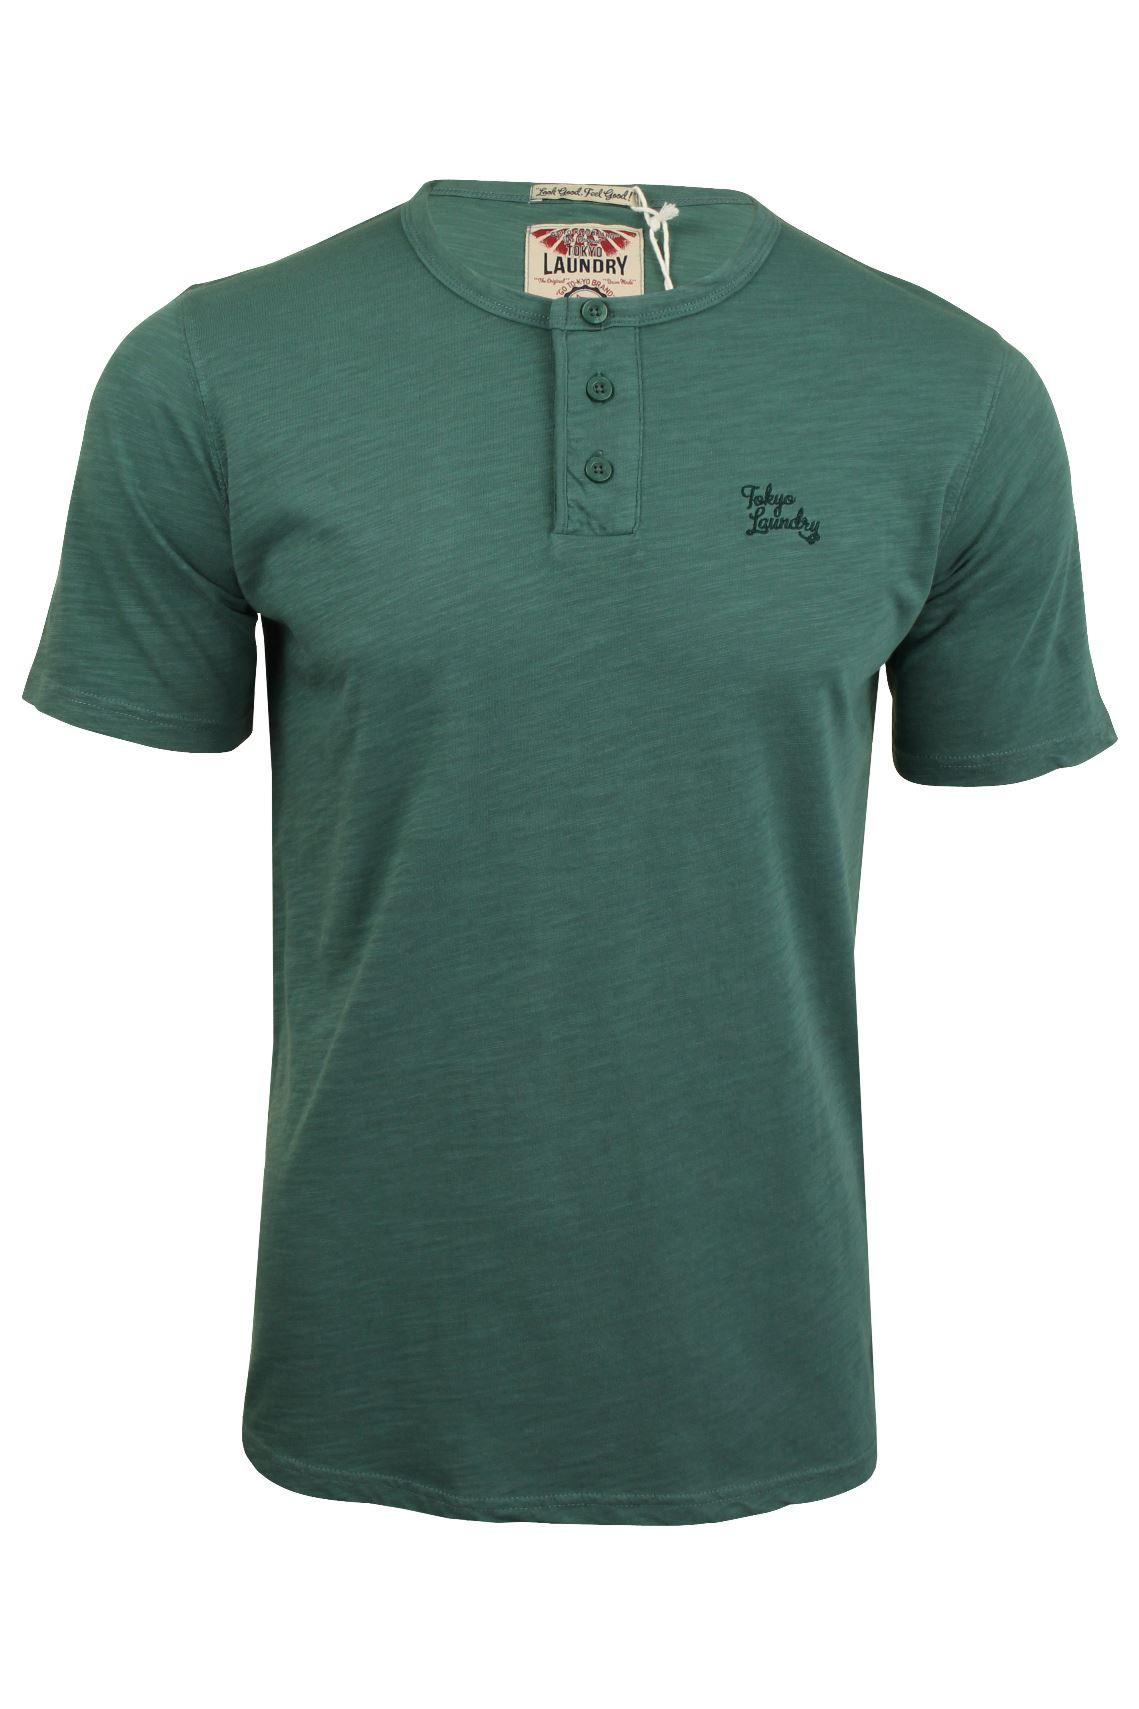 Tokyo-Laundry-Herren-T-Shirt-039-Barry-039-Grandad-Kurzarm